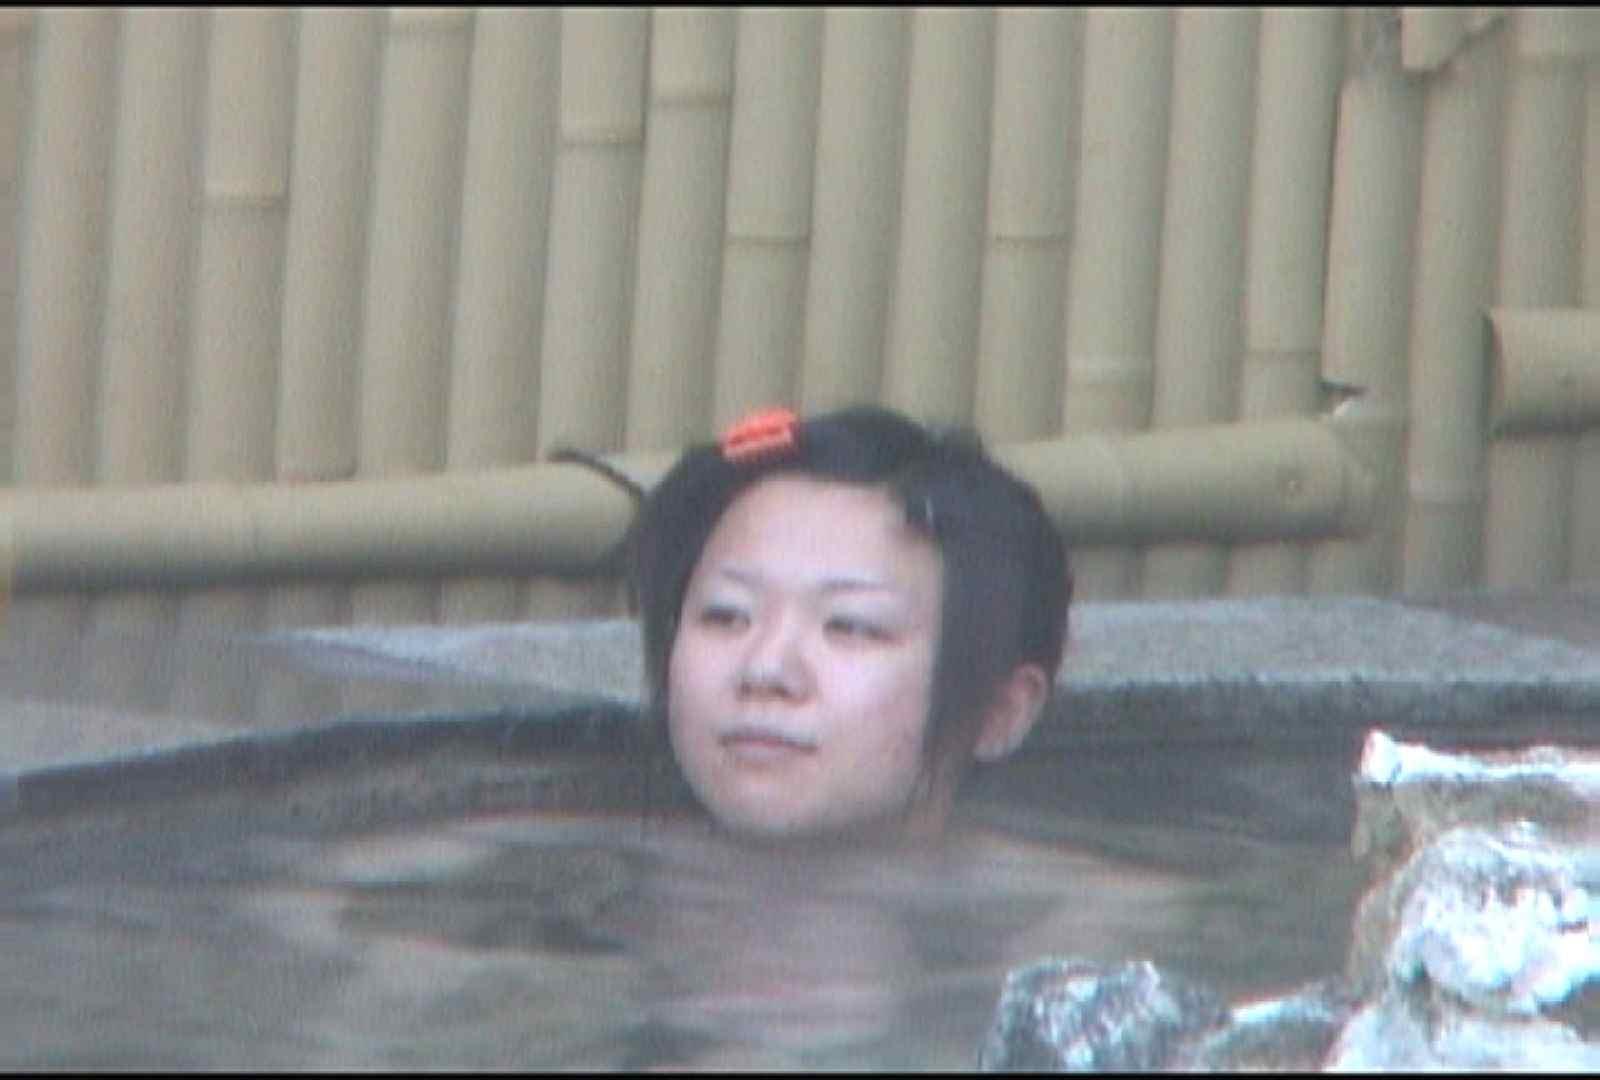 Aquaな露天風呂Vol.175 盗撮シリーズ | 露天風呂編  91PIX 61